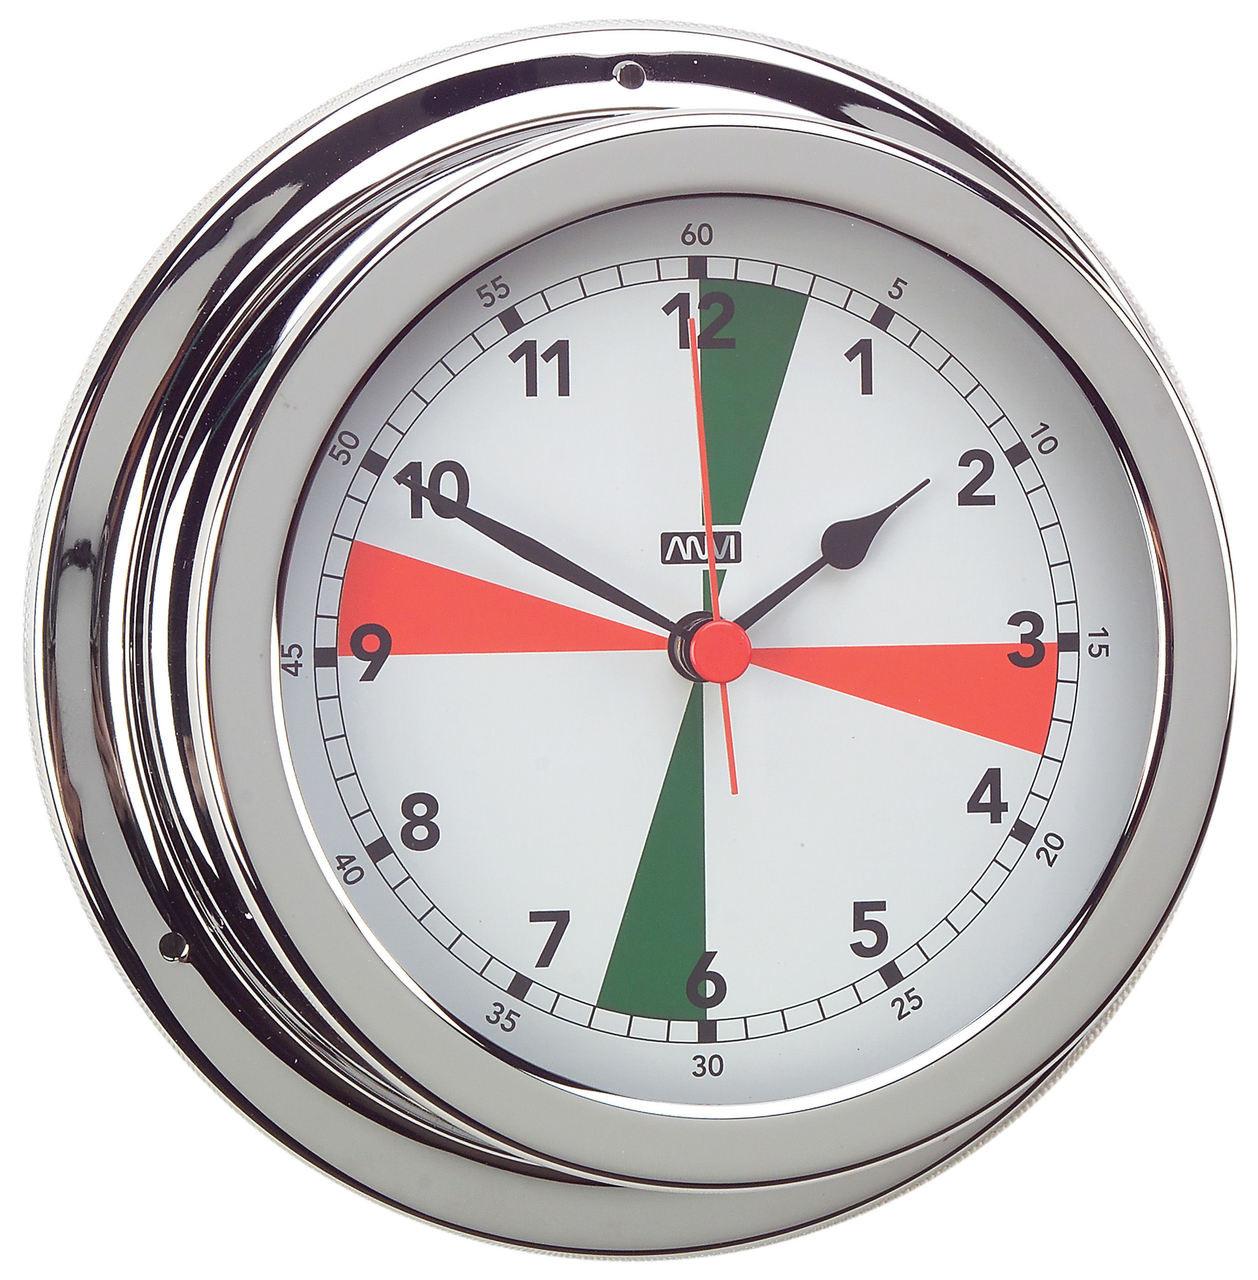 Clock - 120mm Chrome with Radio Silence Zones